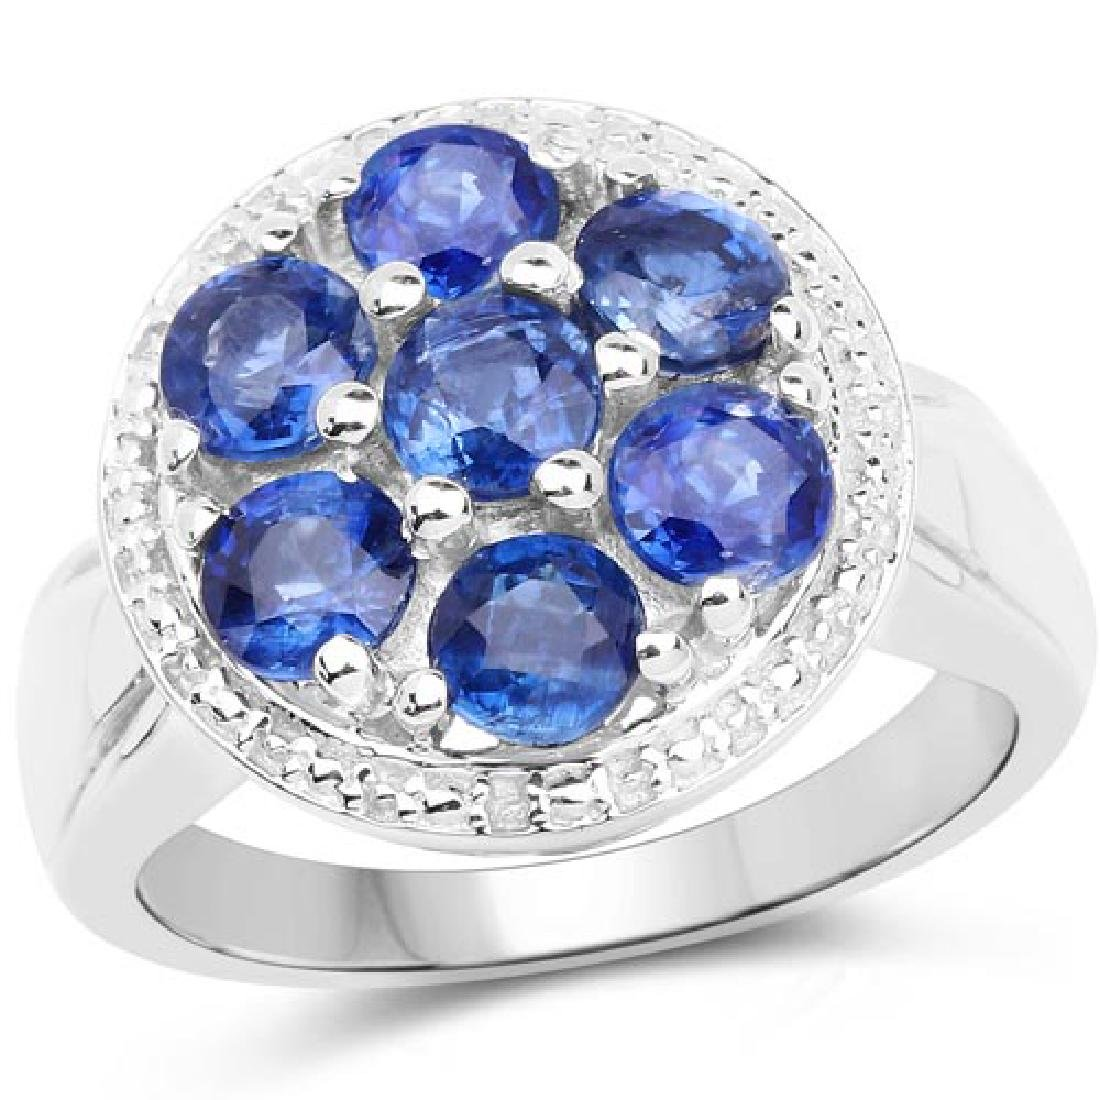 2.66 Carat Genuine Kyanite .925 Sterling Silver Ring